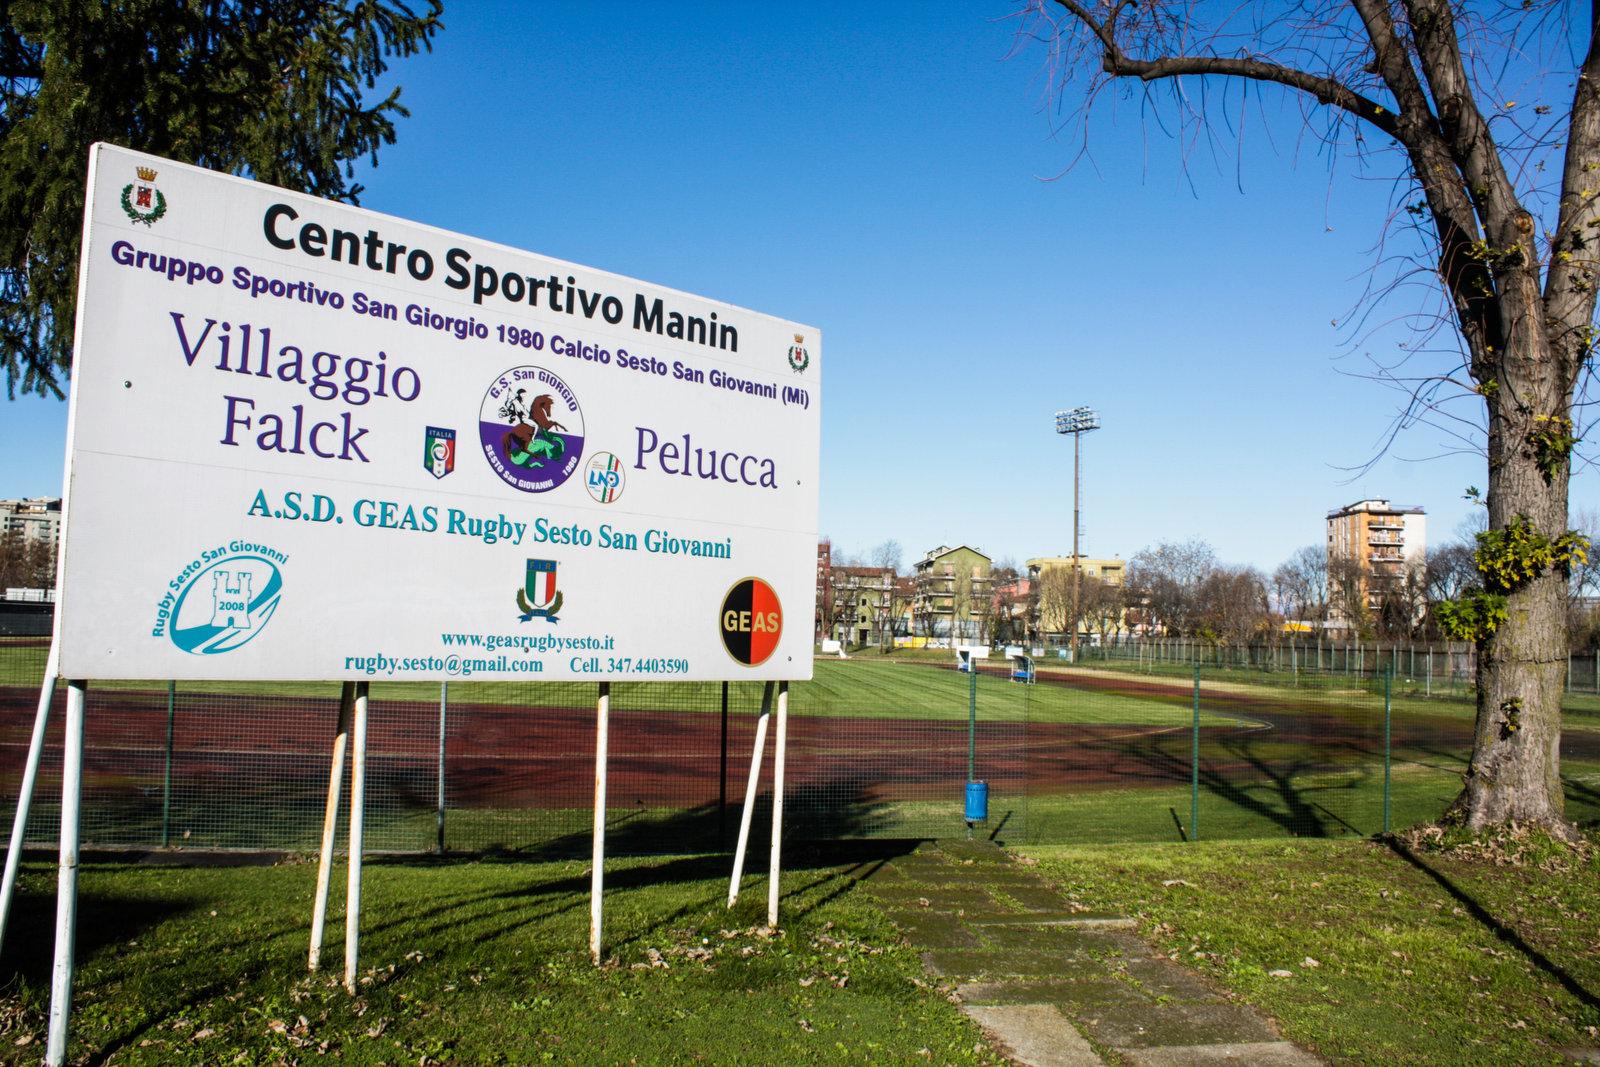 Centro sportivo Manin